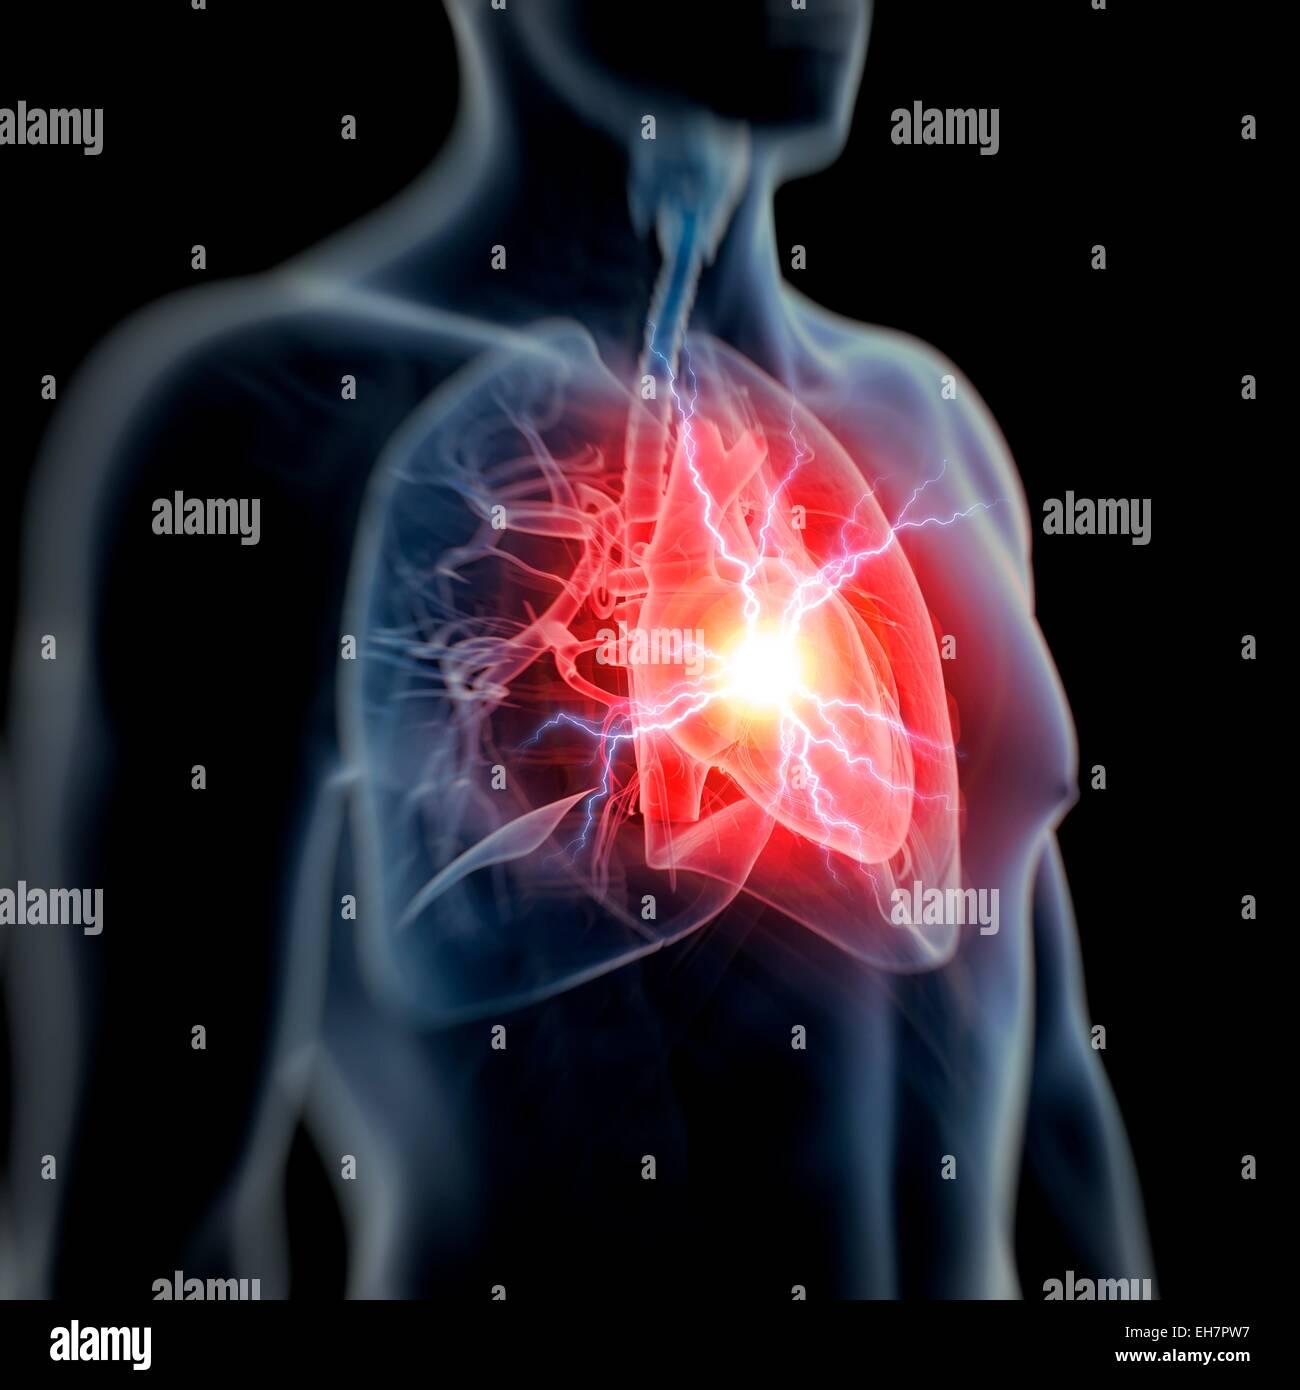 Human heart attack, illustration - Stock Image